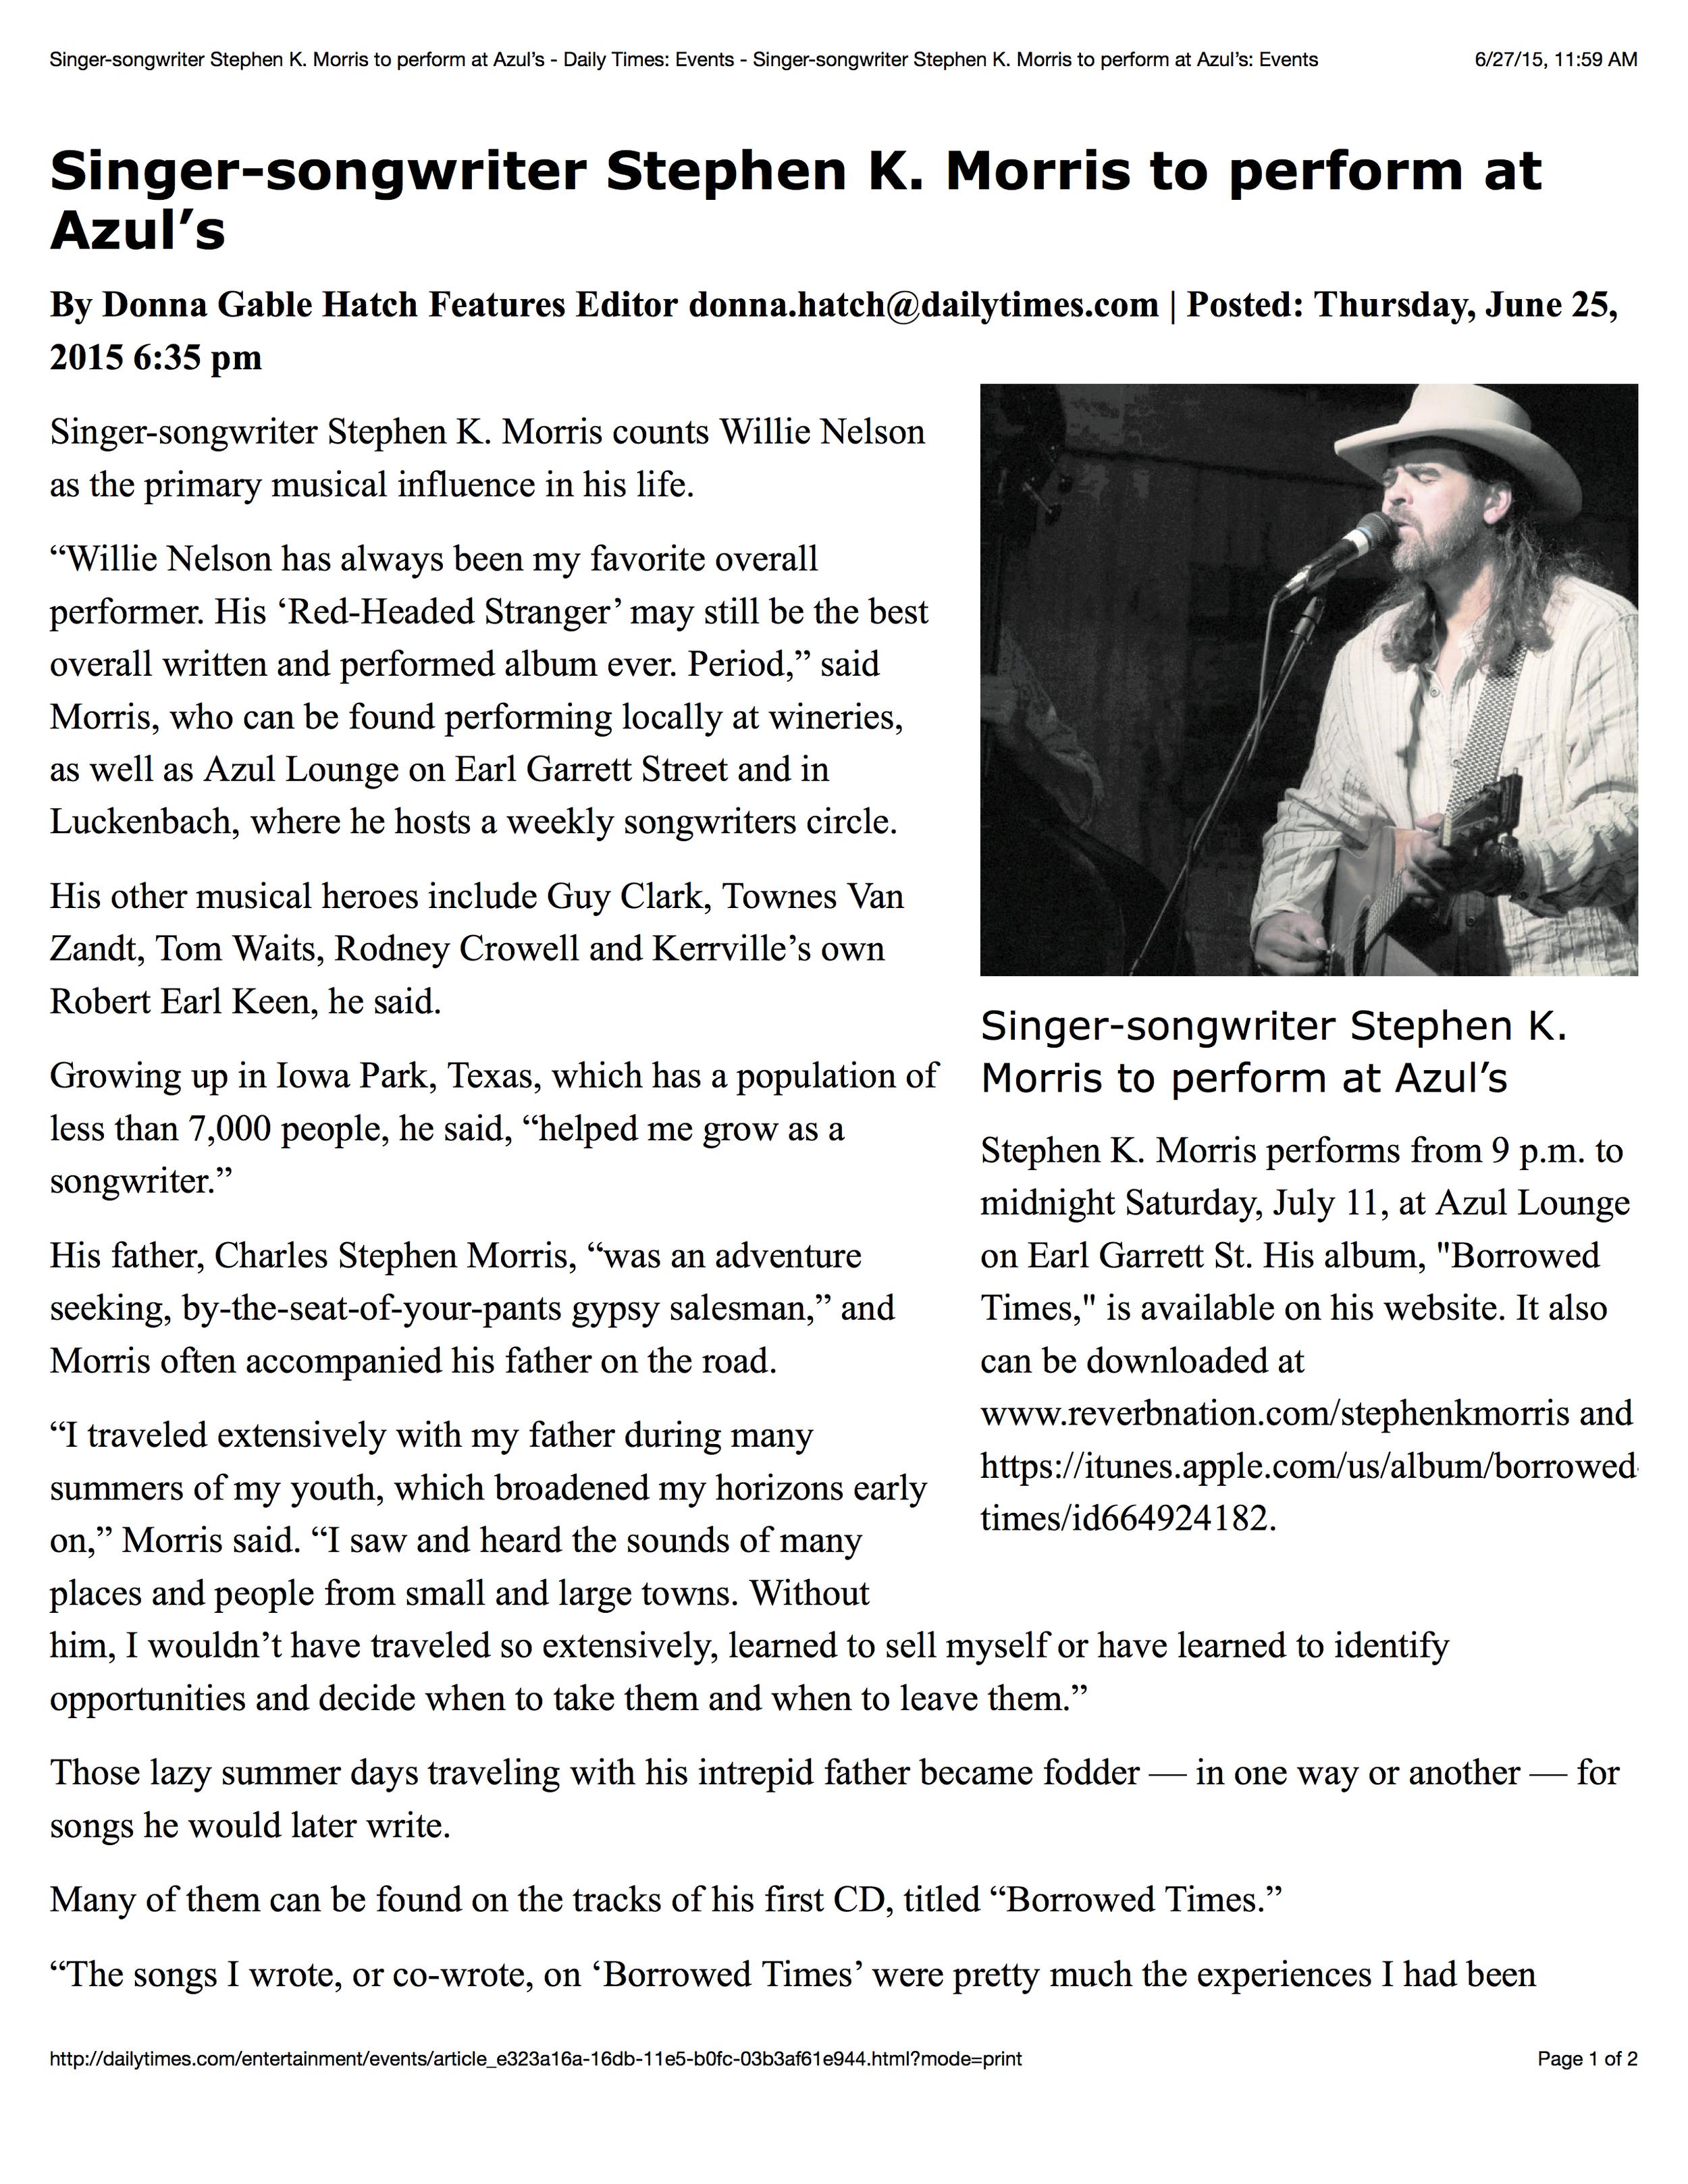 Kerrville Daily Times - Donna Hatch.jpg